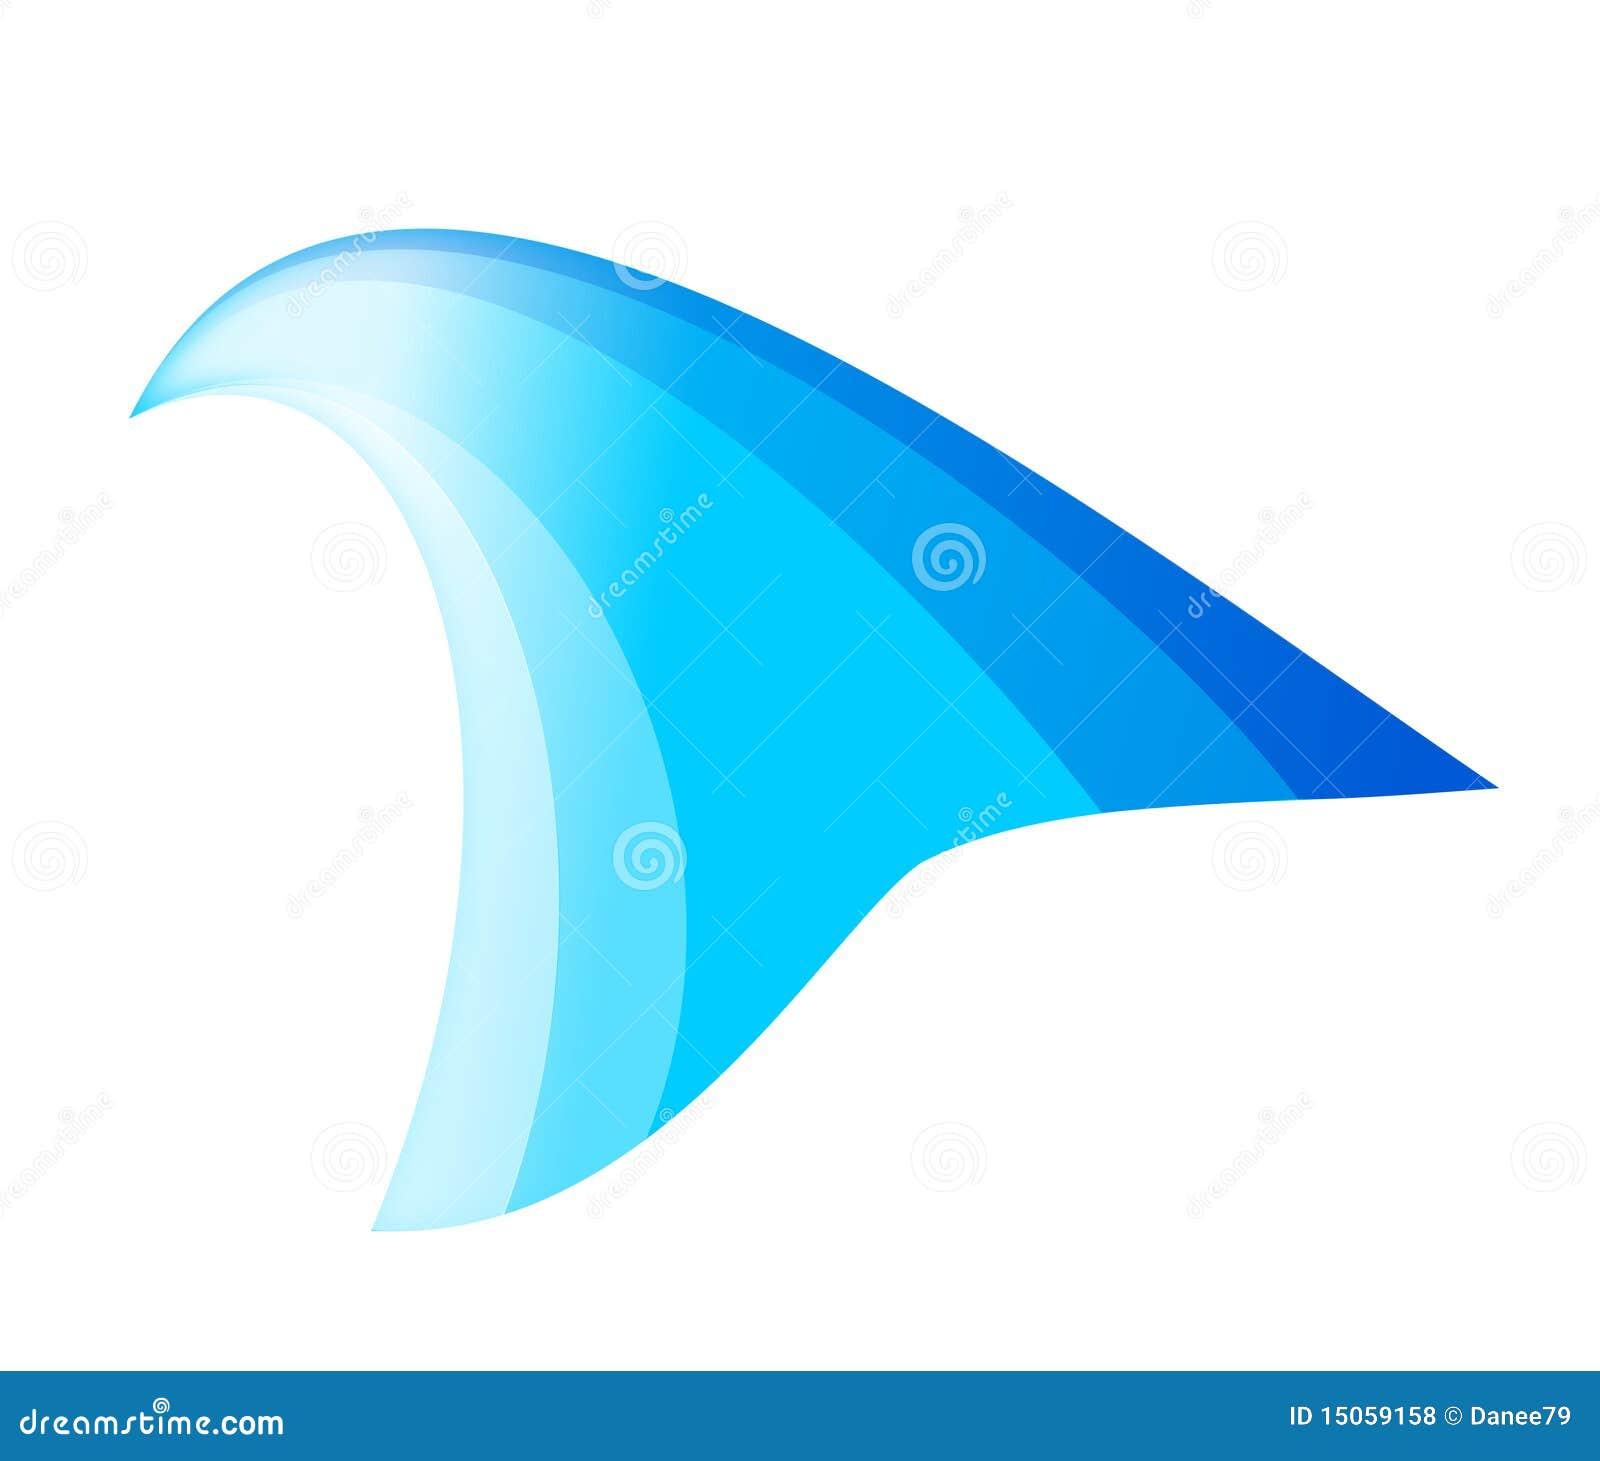 Wave Symbol Royalty Free Stock Photos Image 15059158